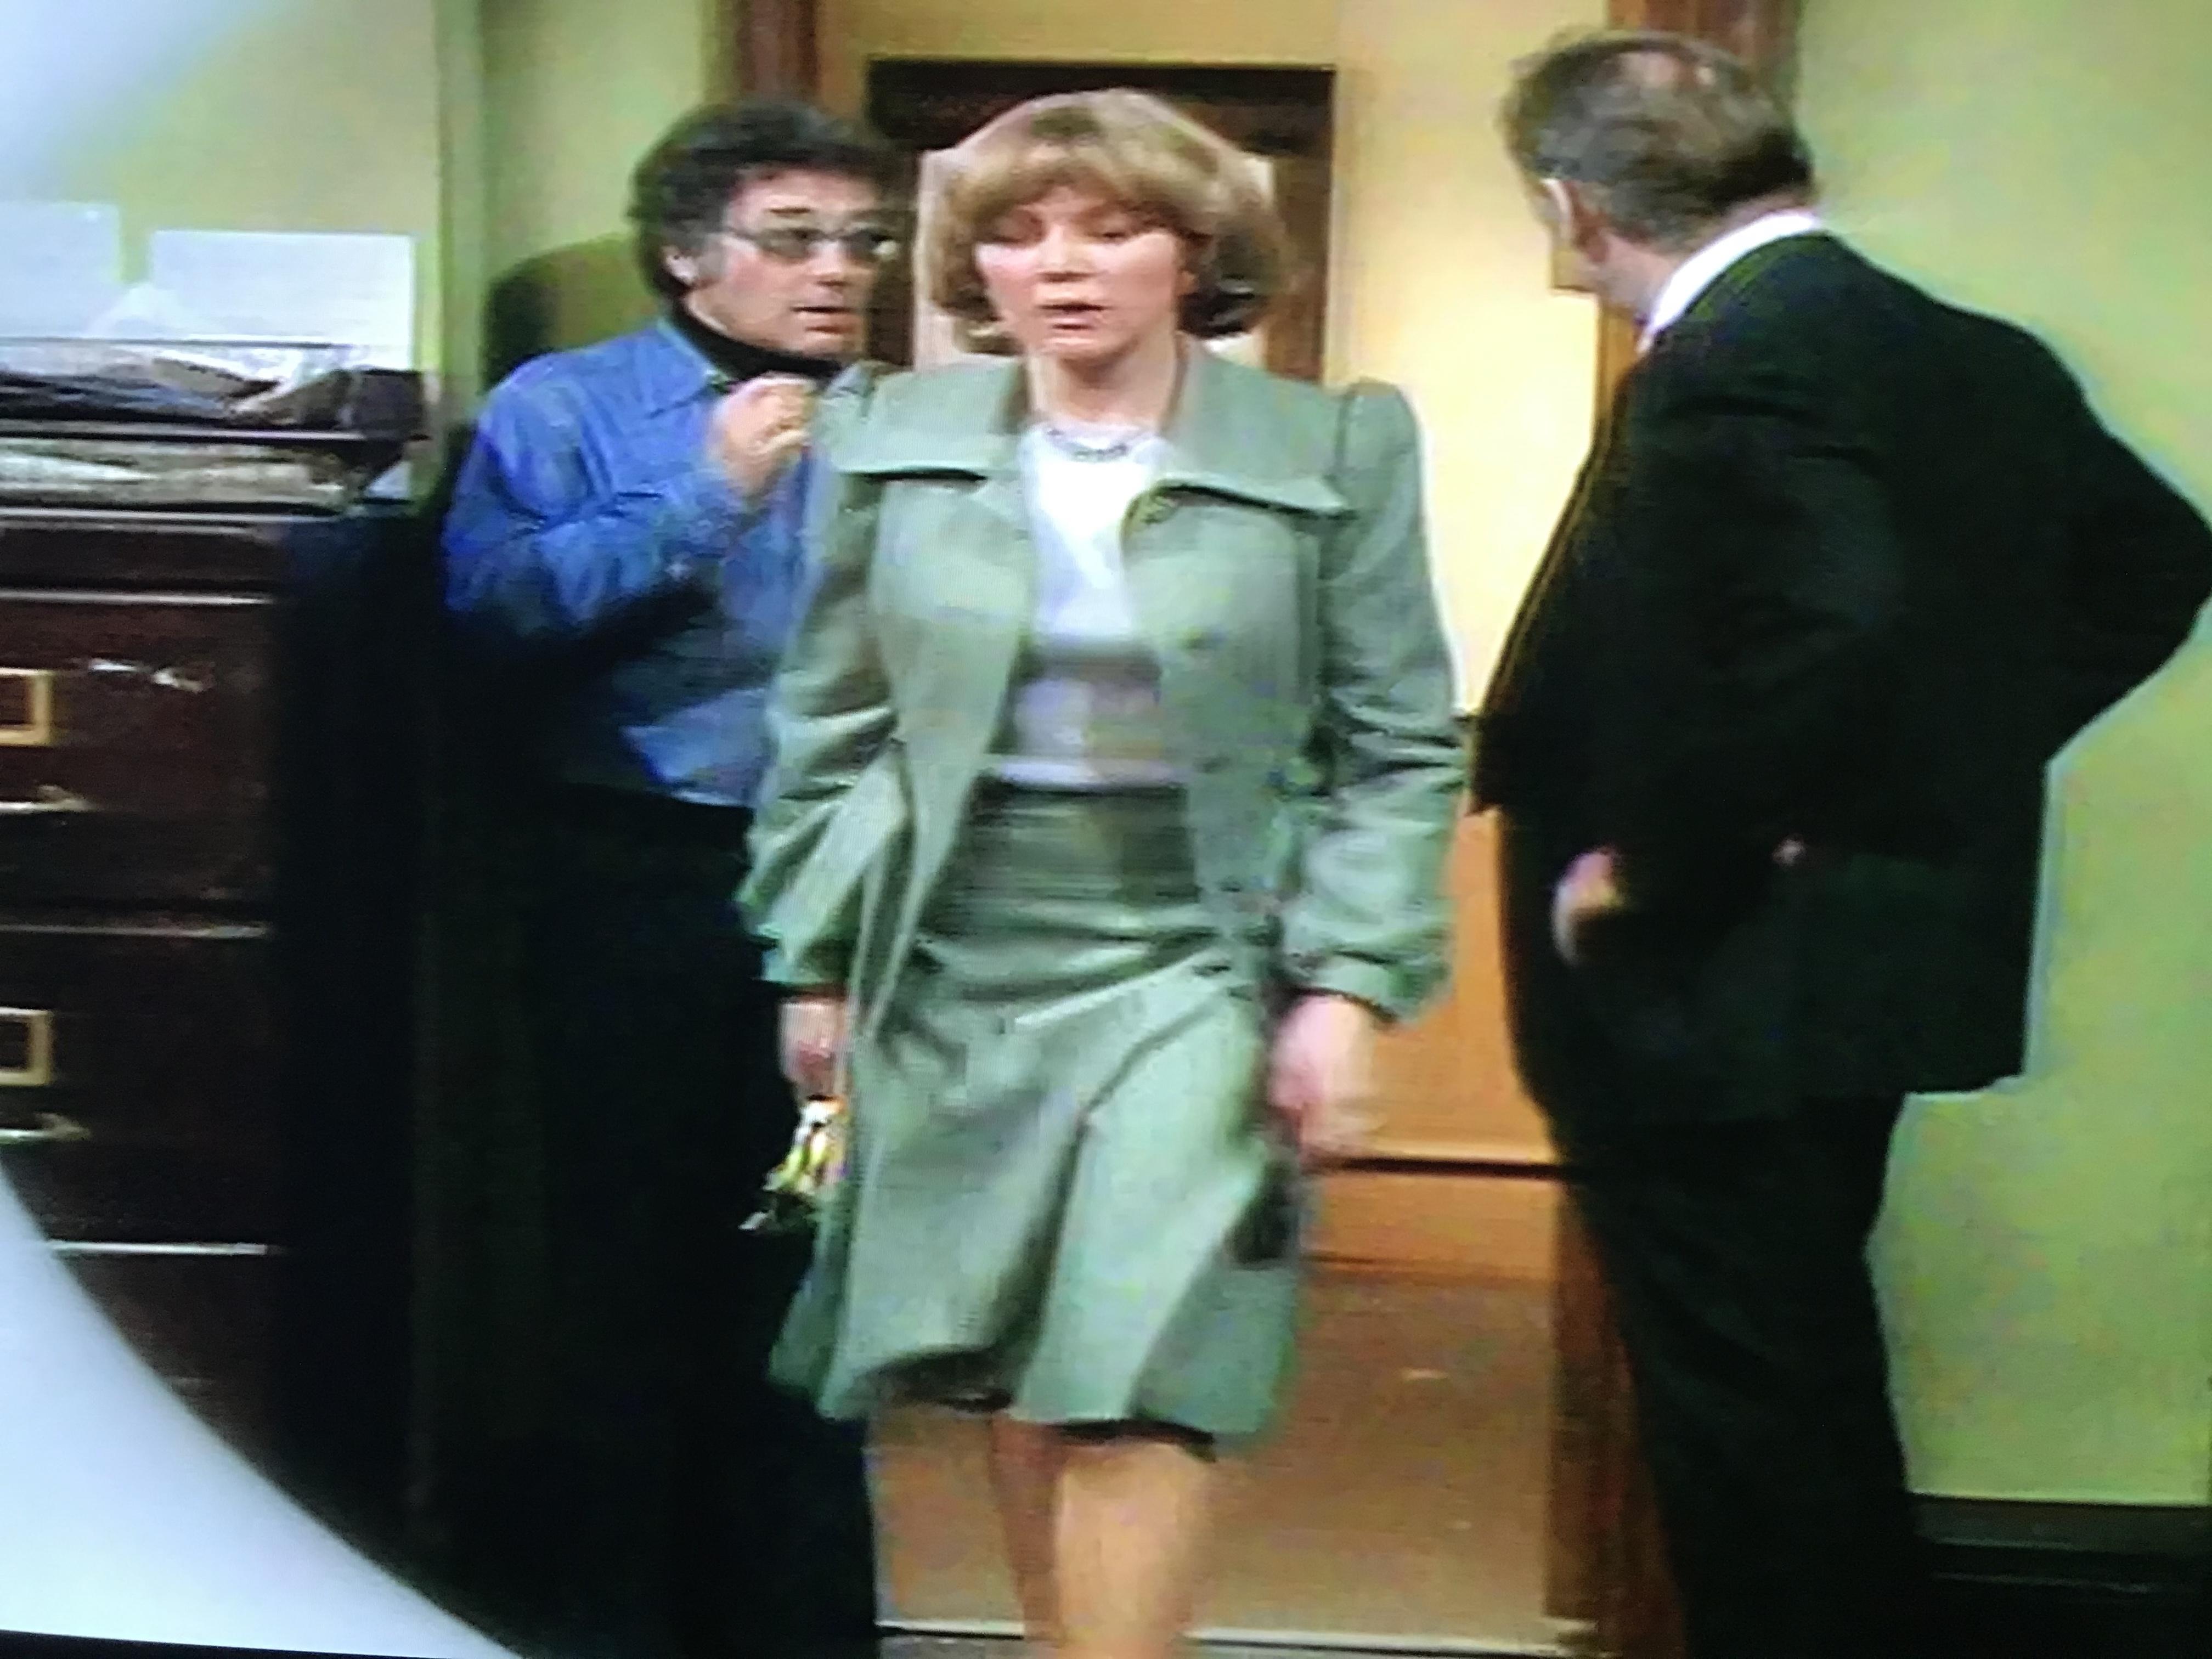 Carol Hawkins, Harry Landis, and David Lodge in Whodunnit? (1972)